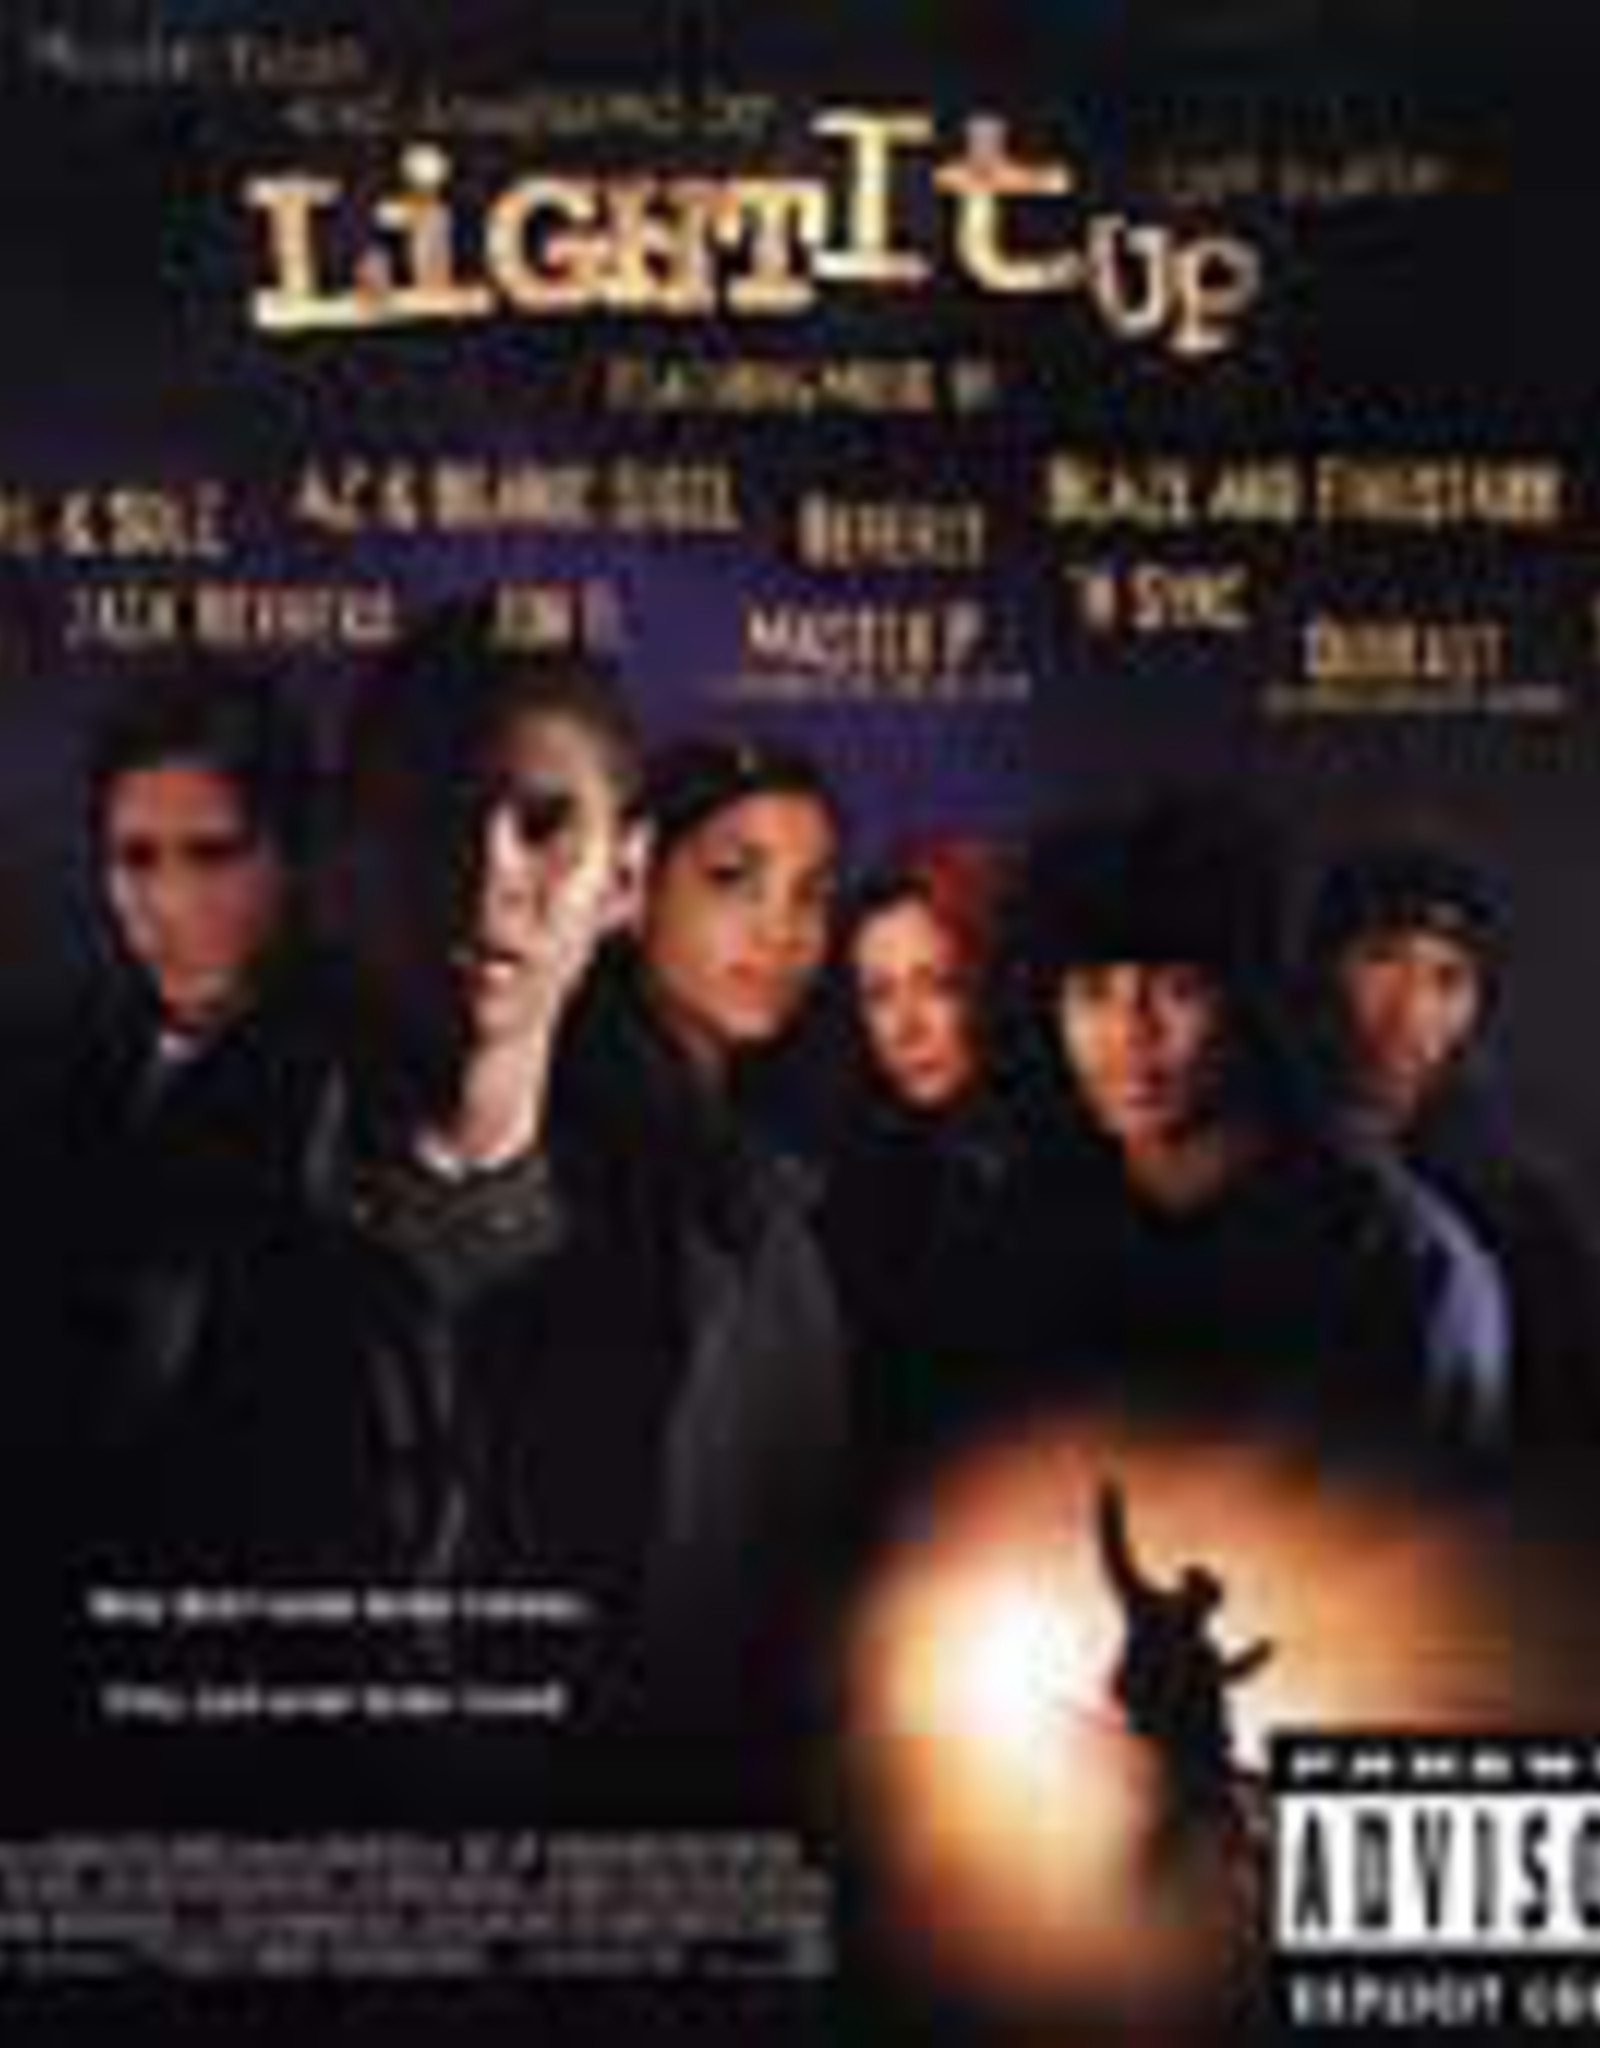 Light It Up - - Original Soundtrack Beanie Siegel / Amil / Az / 112